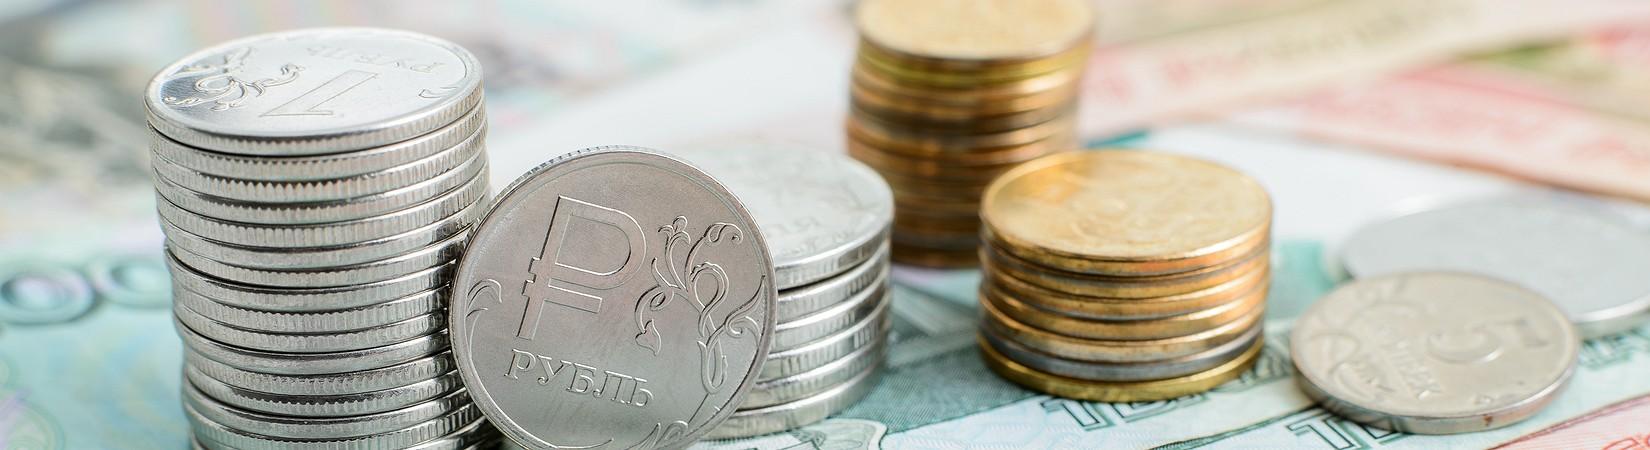 Аналитик: Рубль восстановится до 57 рублей за доллар к концу года